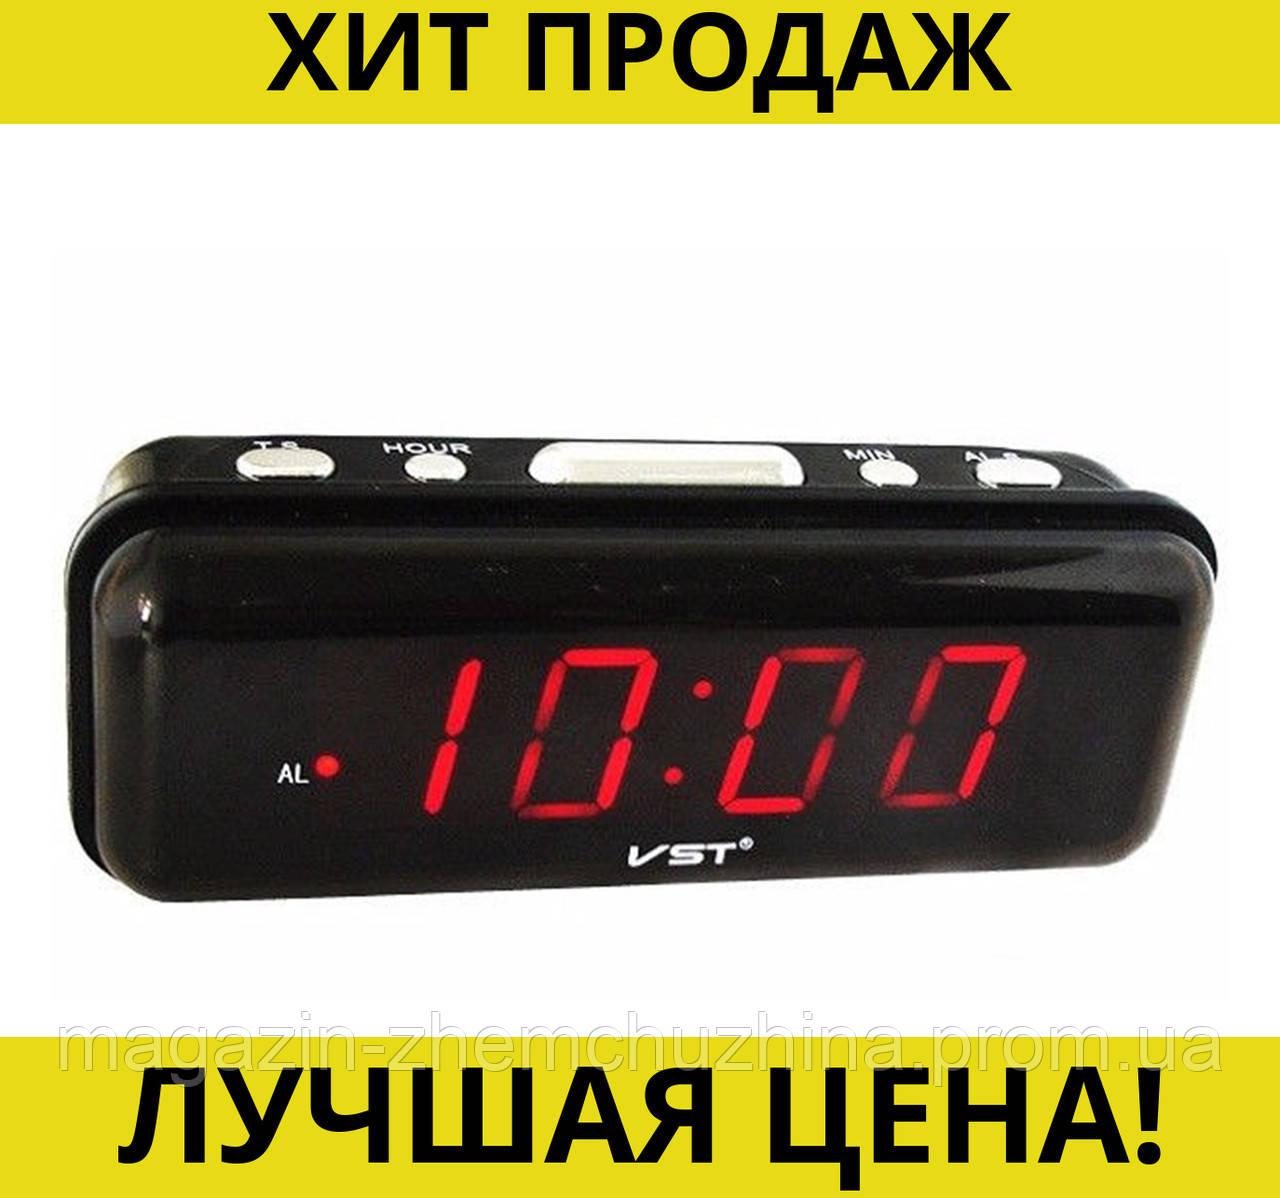 Sale! Часы электронные VST 738-1 с красной подсветкой